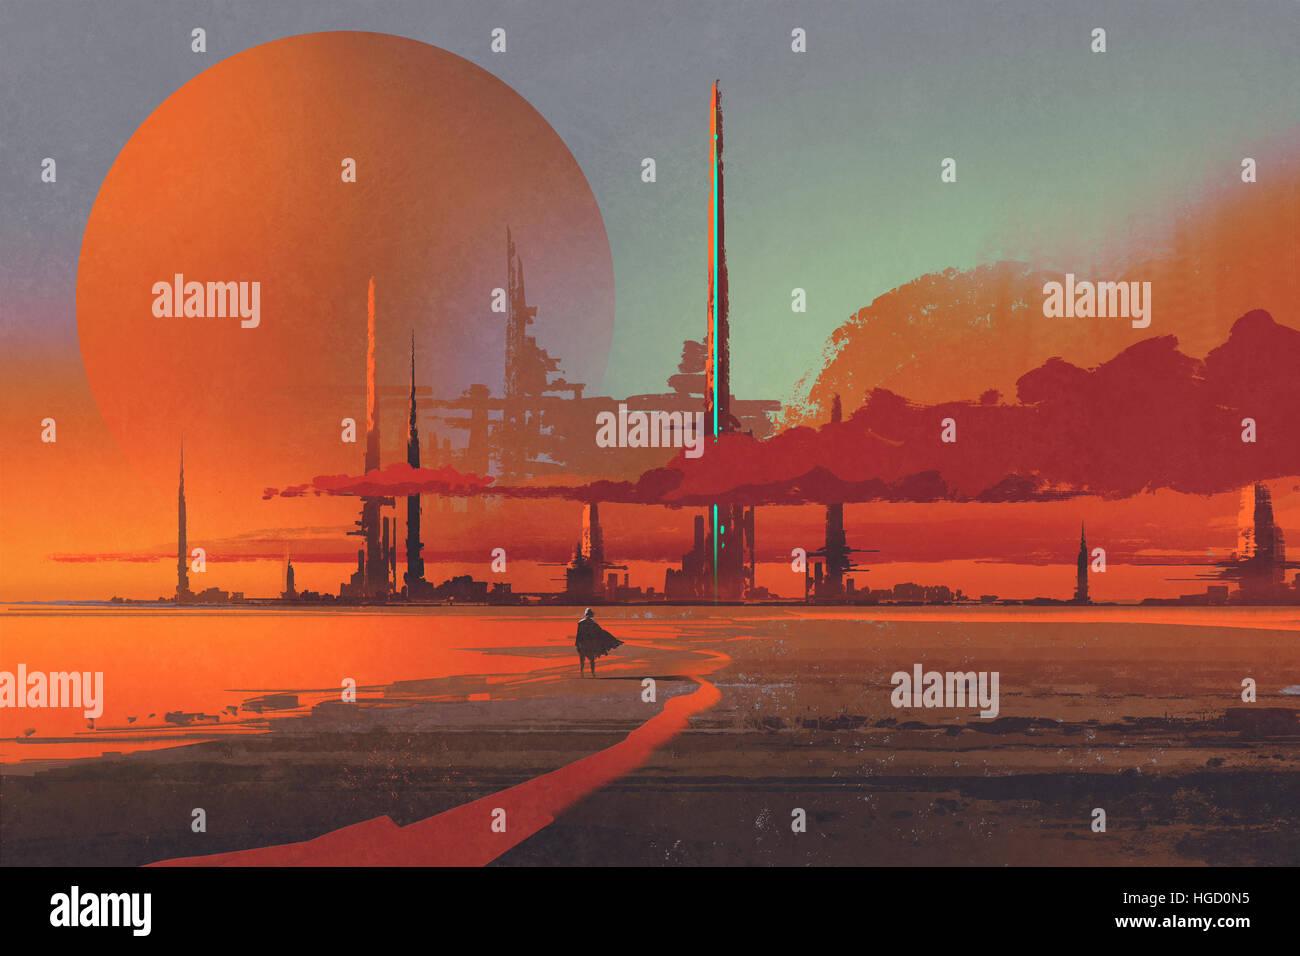 sci-fi construction in the desert,illustration digital painting Stock Photo